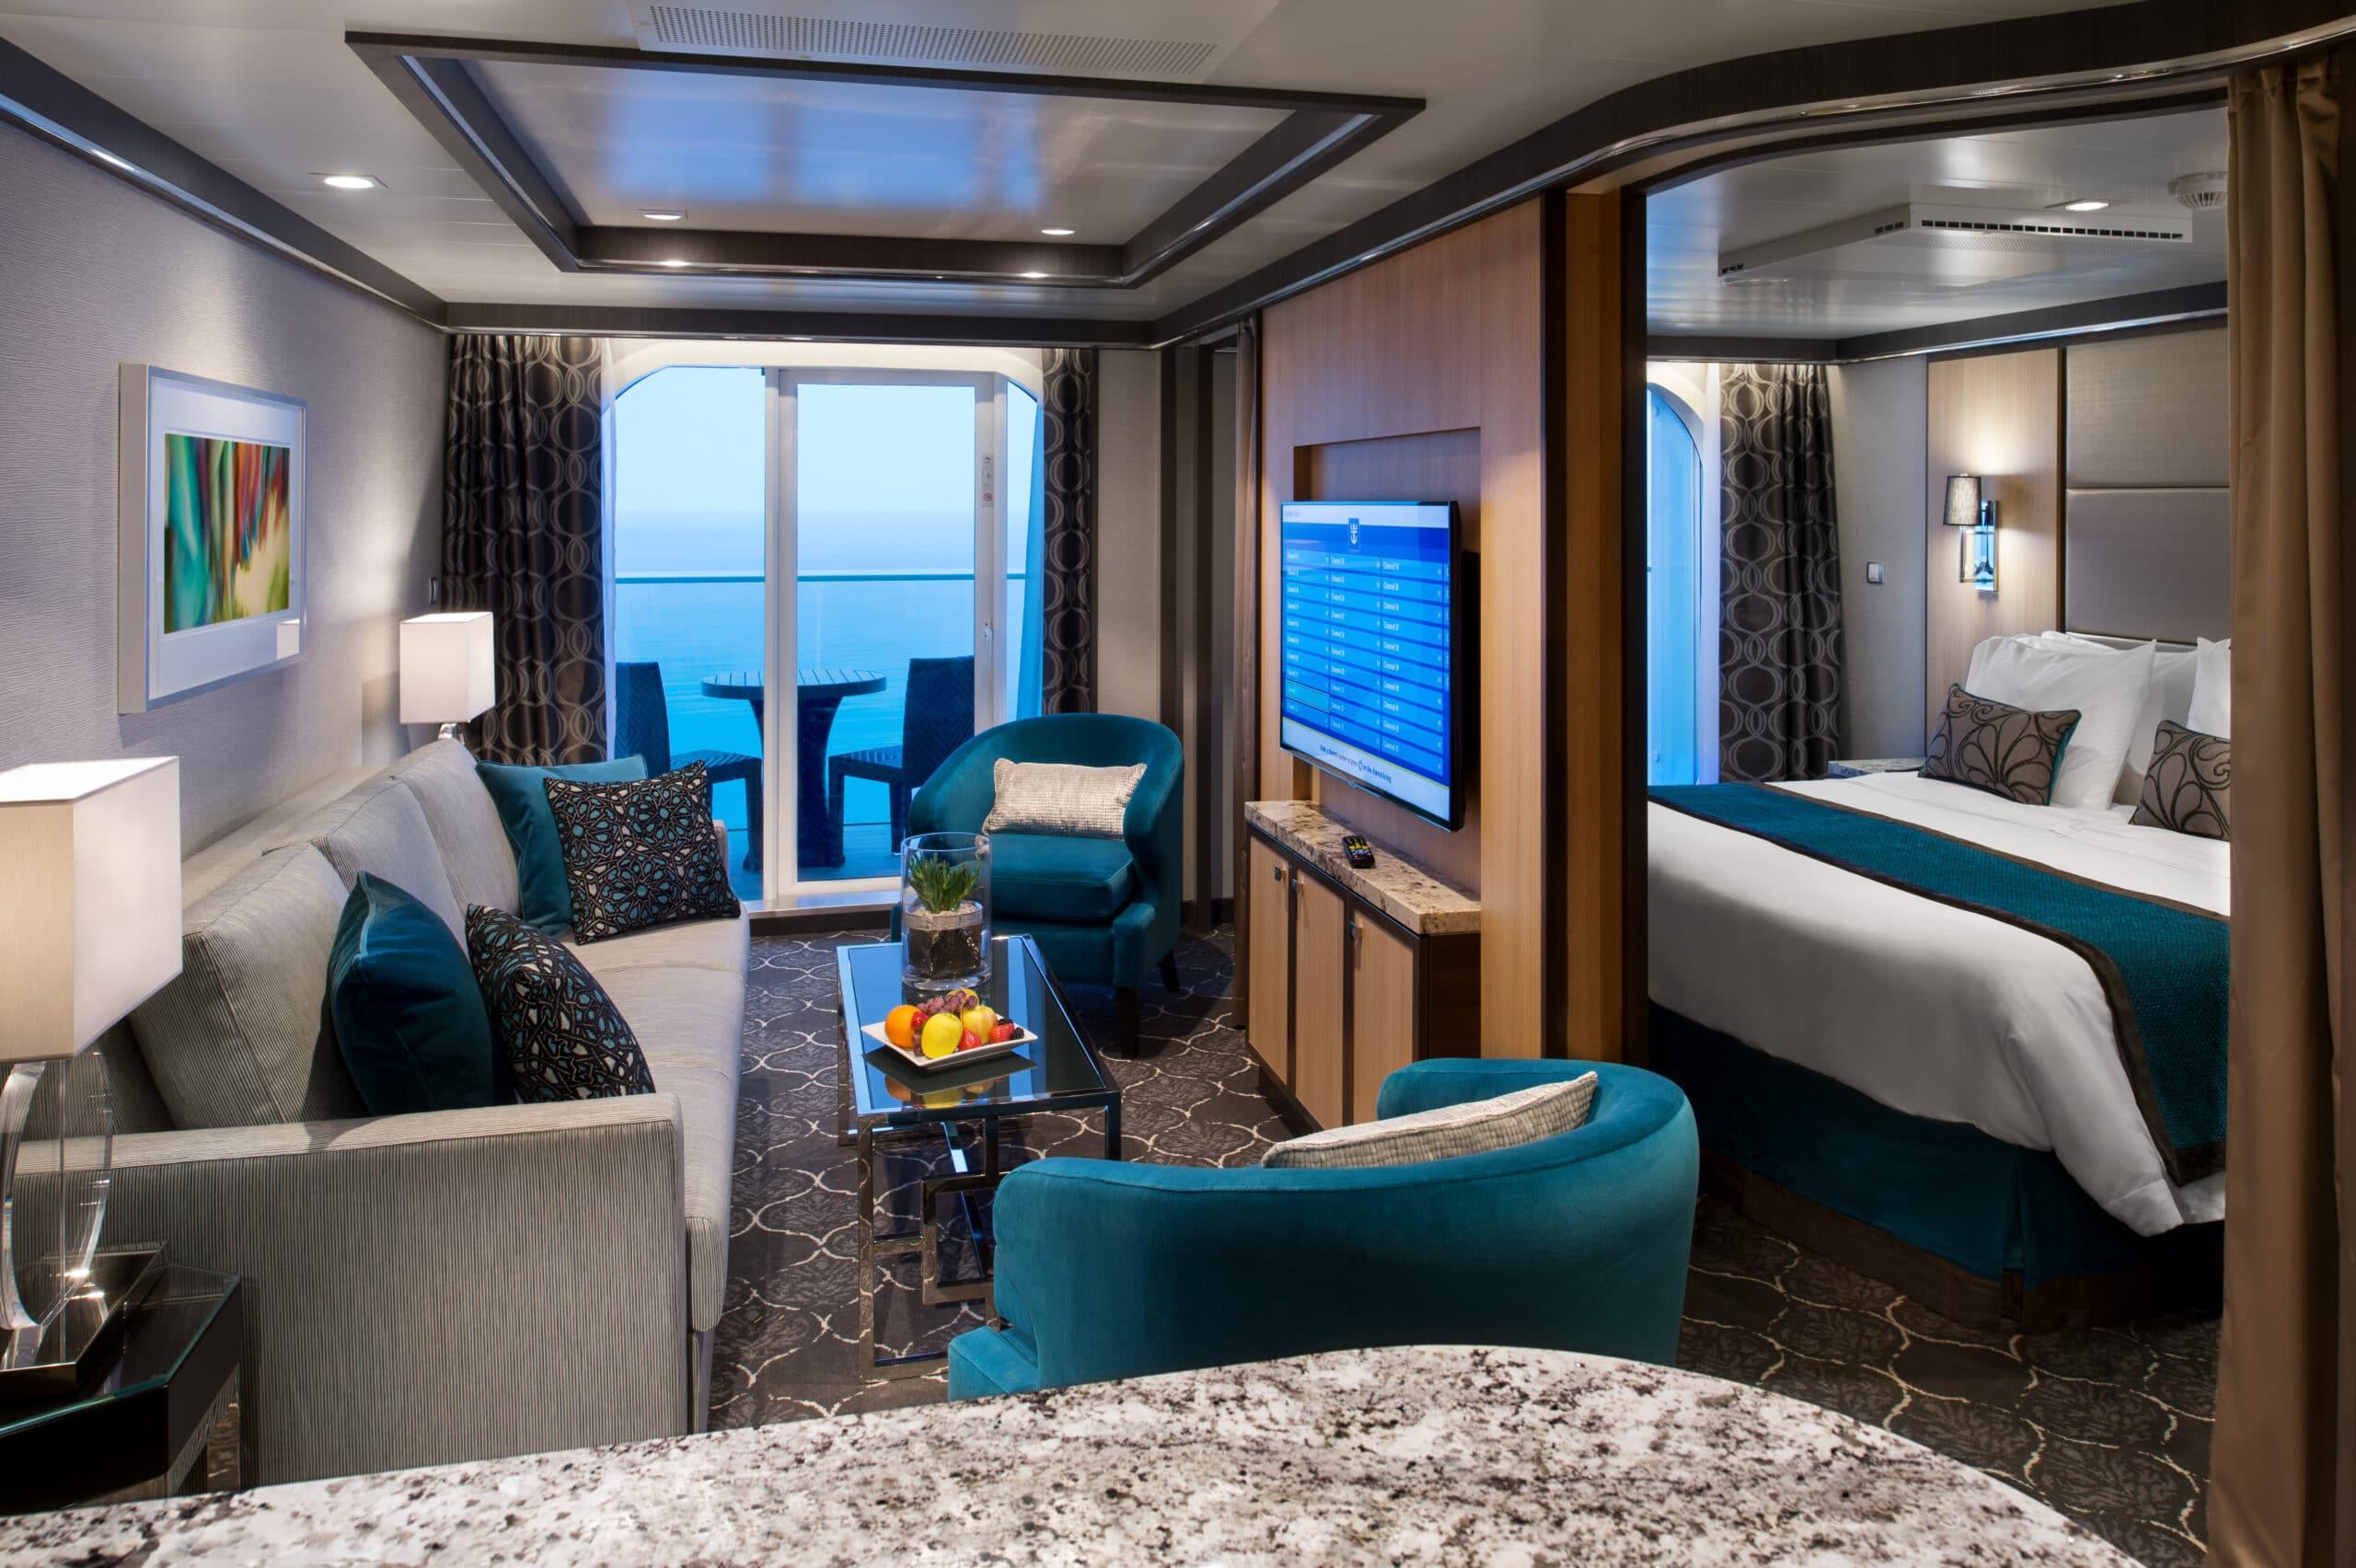 Royal-Caribbean-International-Harmony-of-the-Seas-Symphony-of-the-seas-schip-cruiseschip-categorie-GS-Grand-Suite